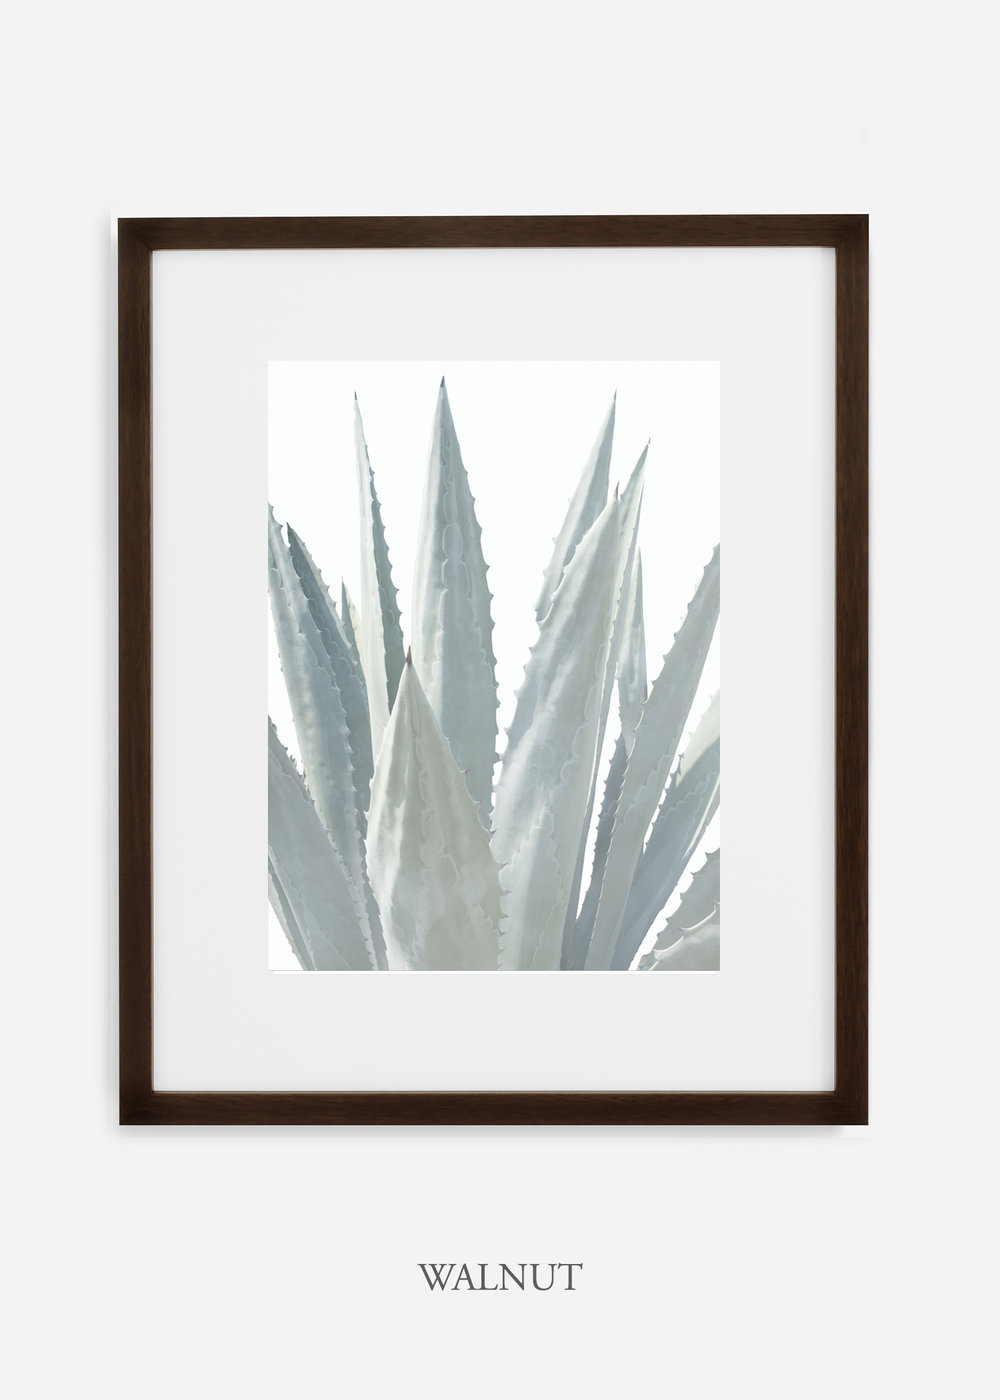 winterwhite_walnutframe_WinterWhiteAgaveNo.3_agave_prints_interiordesign_art_homedecor_bohemian_modern_minimal_photography_cactusphotography.jpg